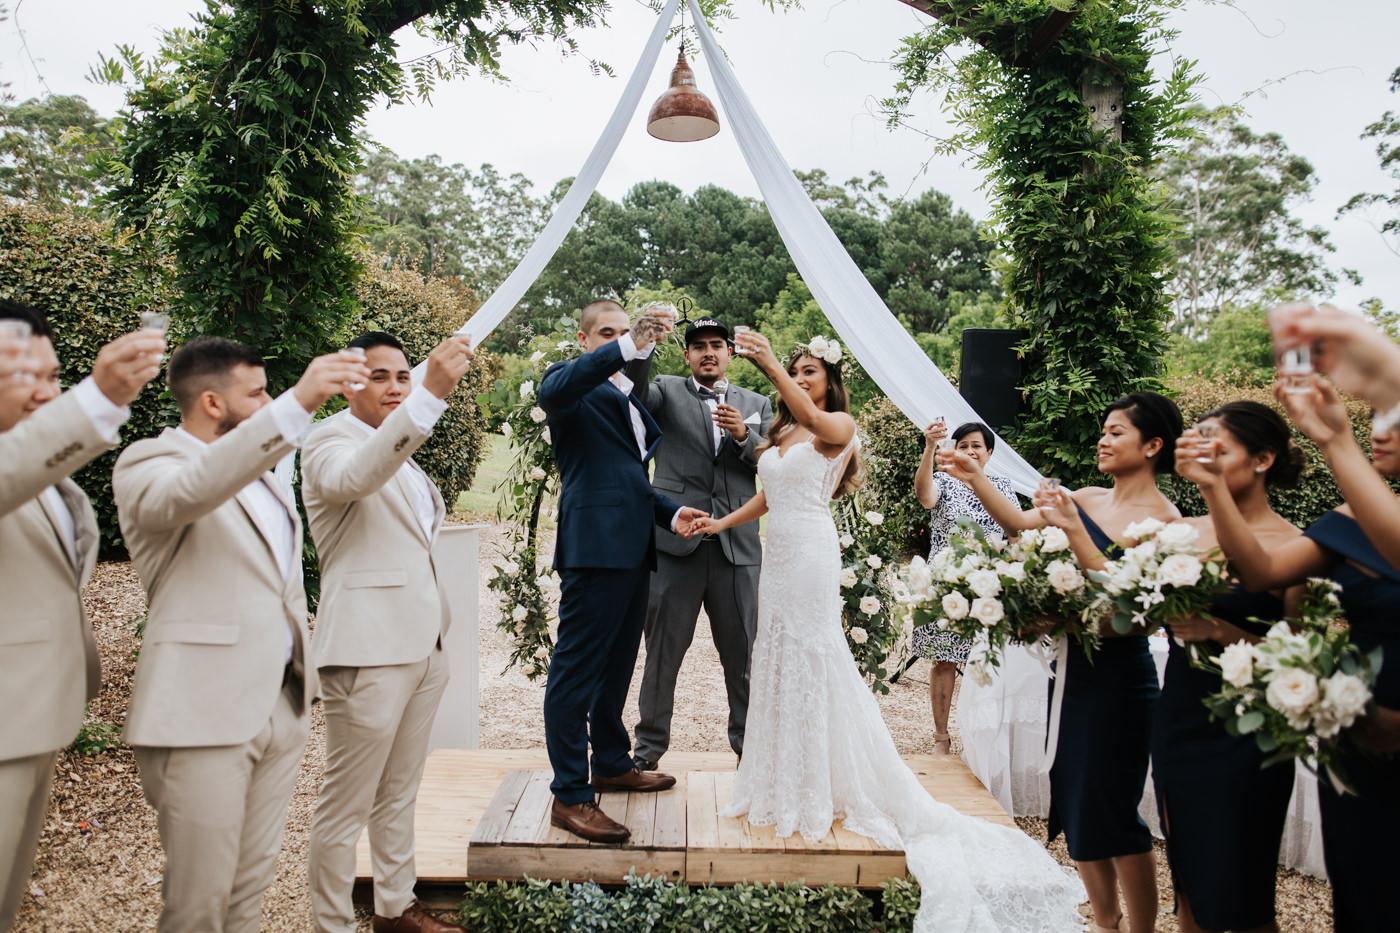 Nick & Vanezza - Fernbank Farm Wedding - Samantha Heather Photography-77.jpg